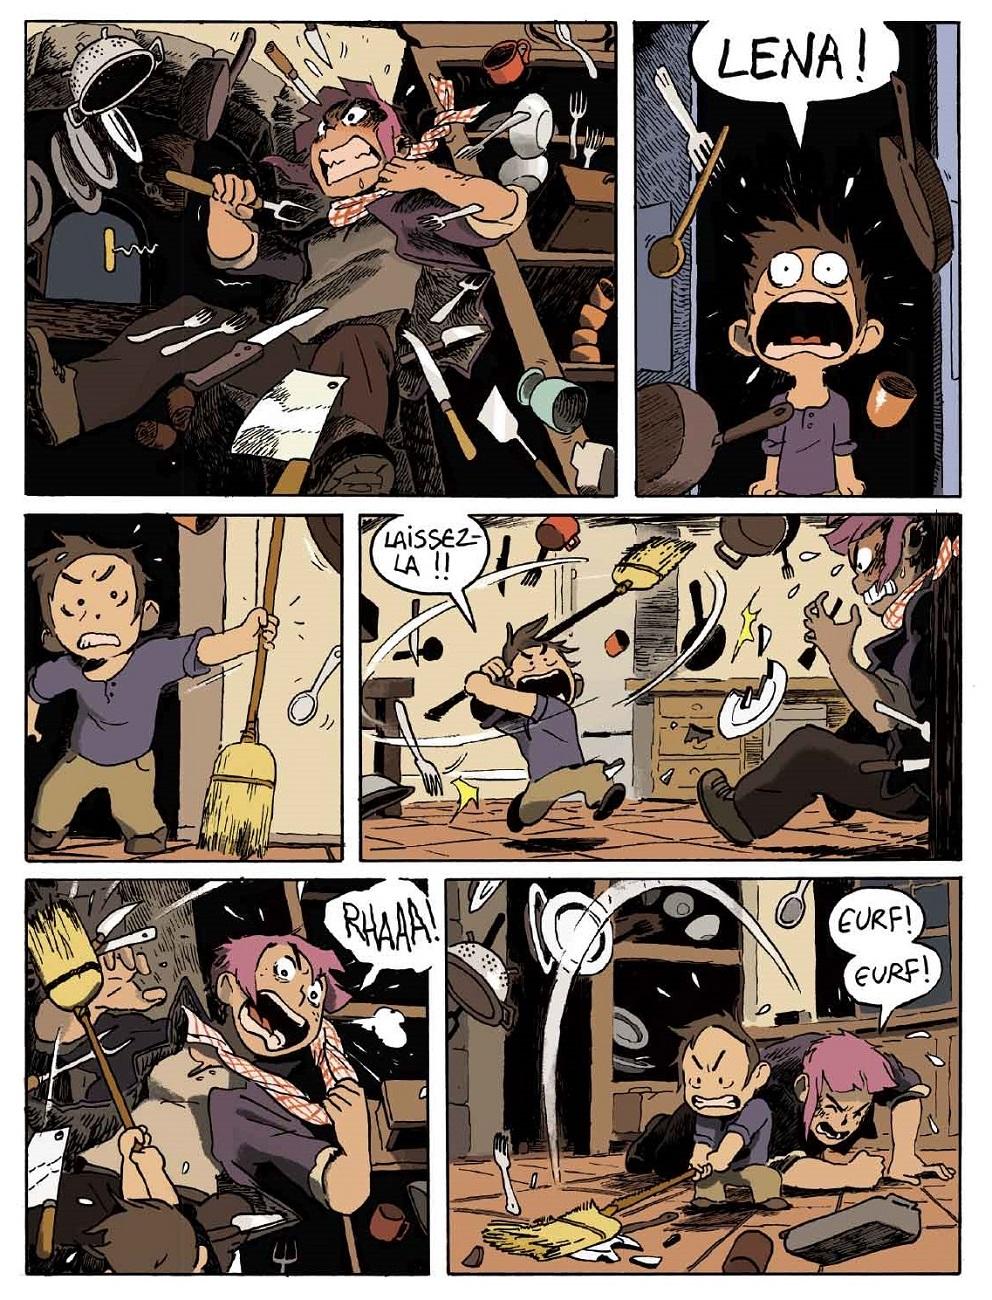 Lena luttte contre un korrigan